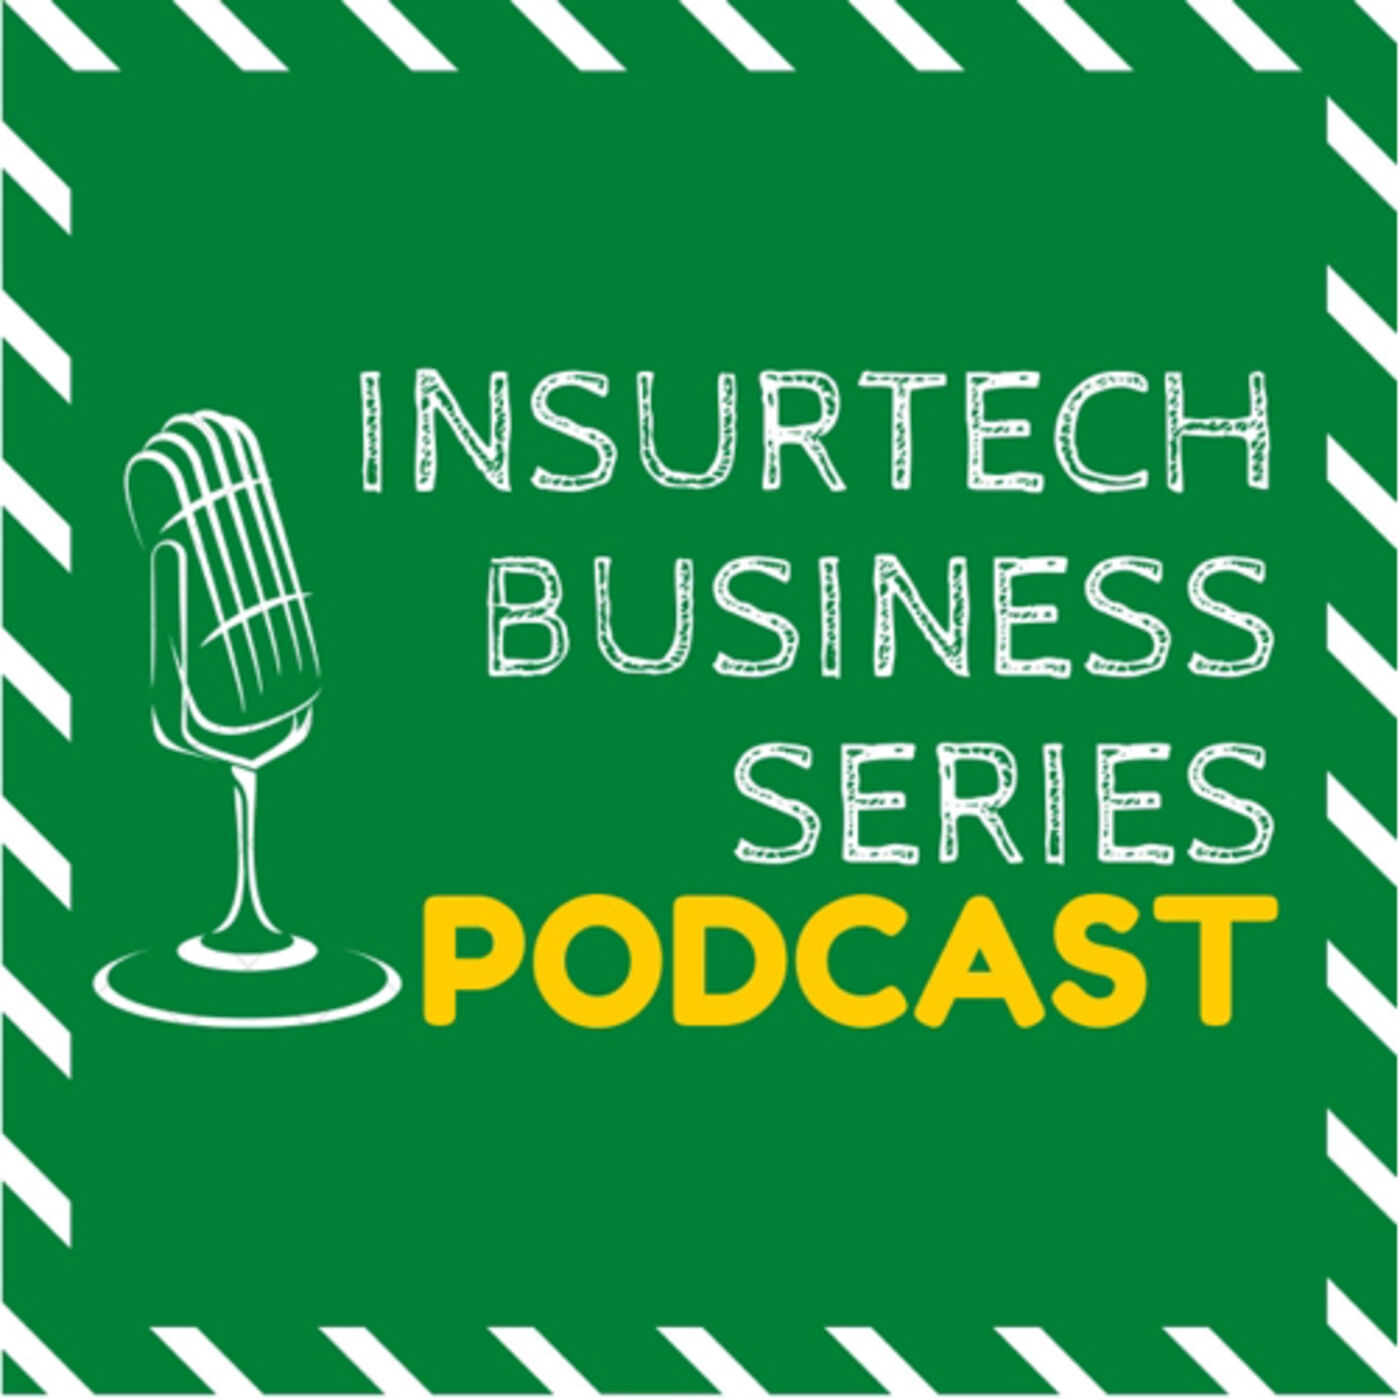 InsurTech Business Series on Jamit